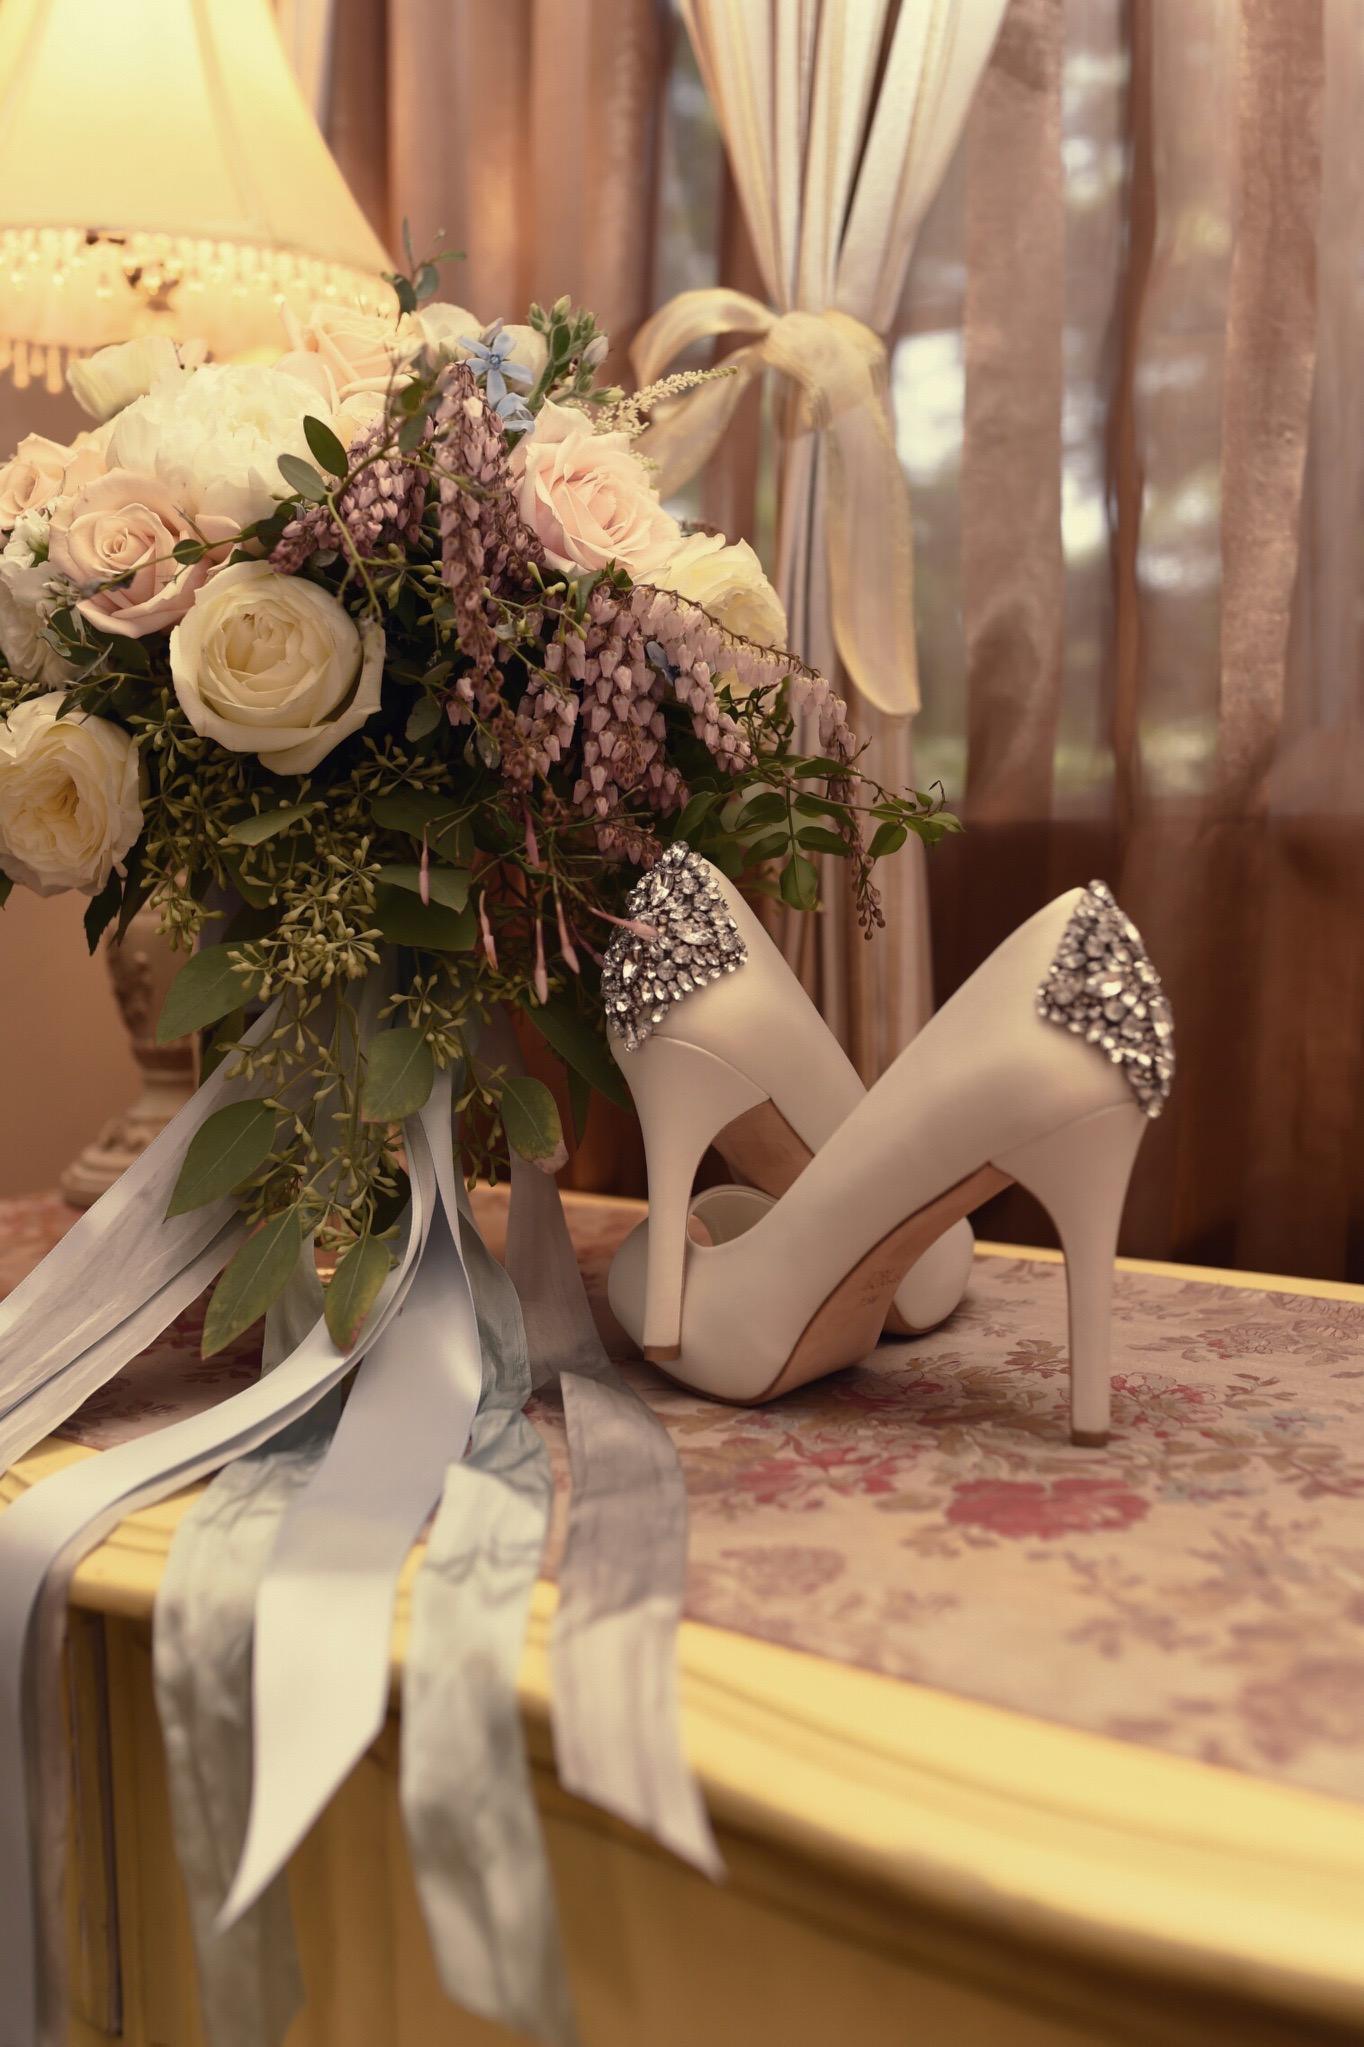 bouquet_heels_wedding_details_violette_fleurs.jpg